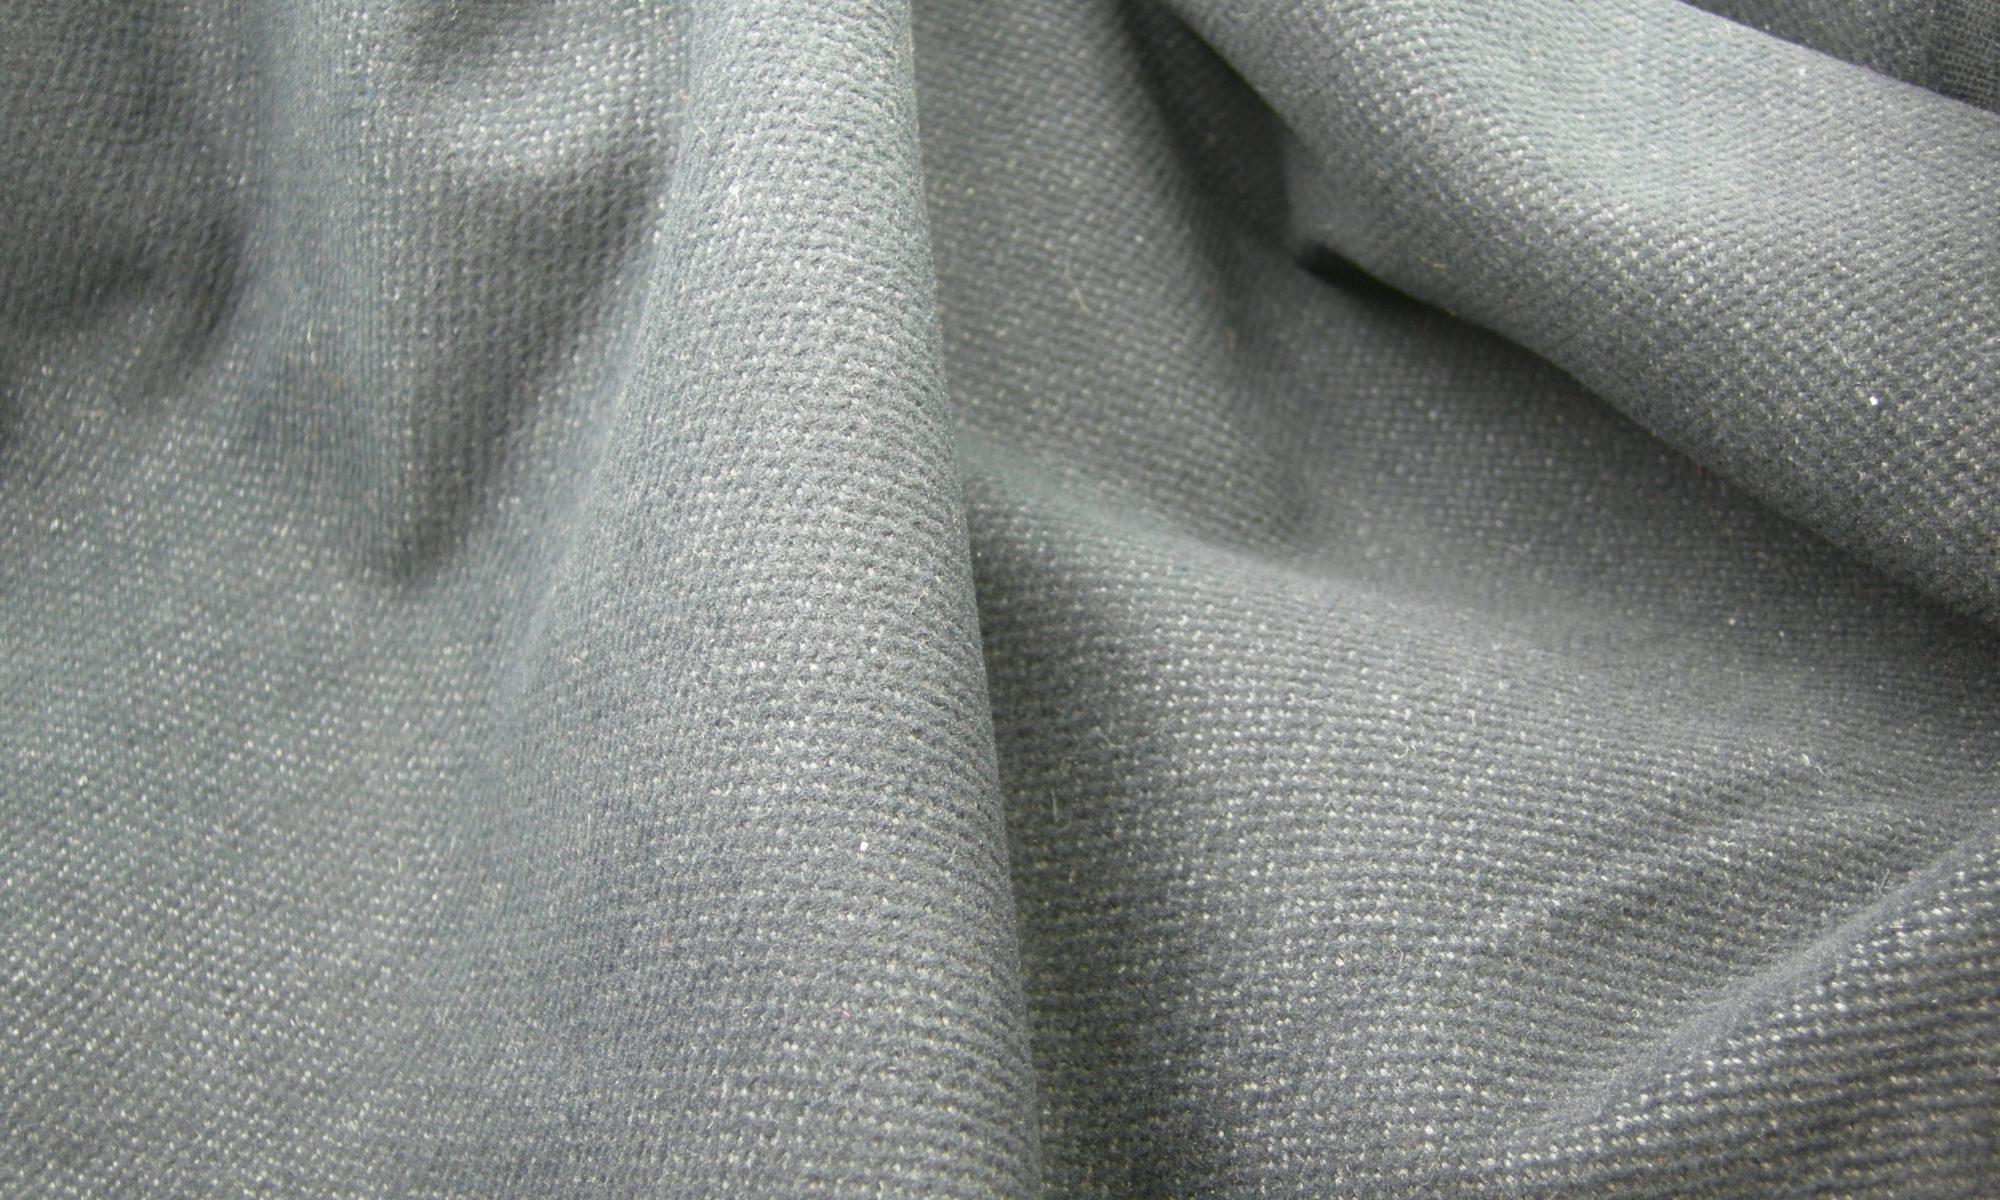 ART 7195 tiny herringbone moleskin coat fabric WIDTH cm150 WEIGHT gr530 COMPOSITION 82 cotton 18 polyester - 250mts